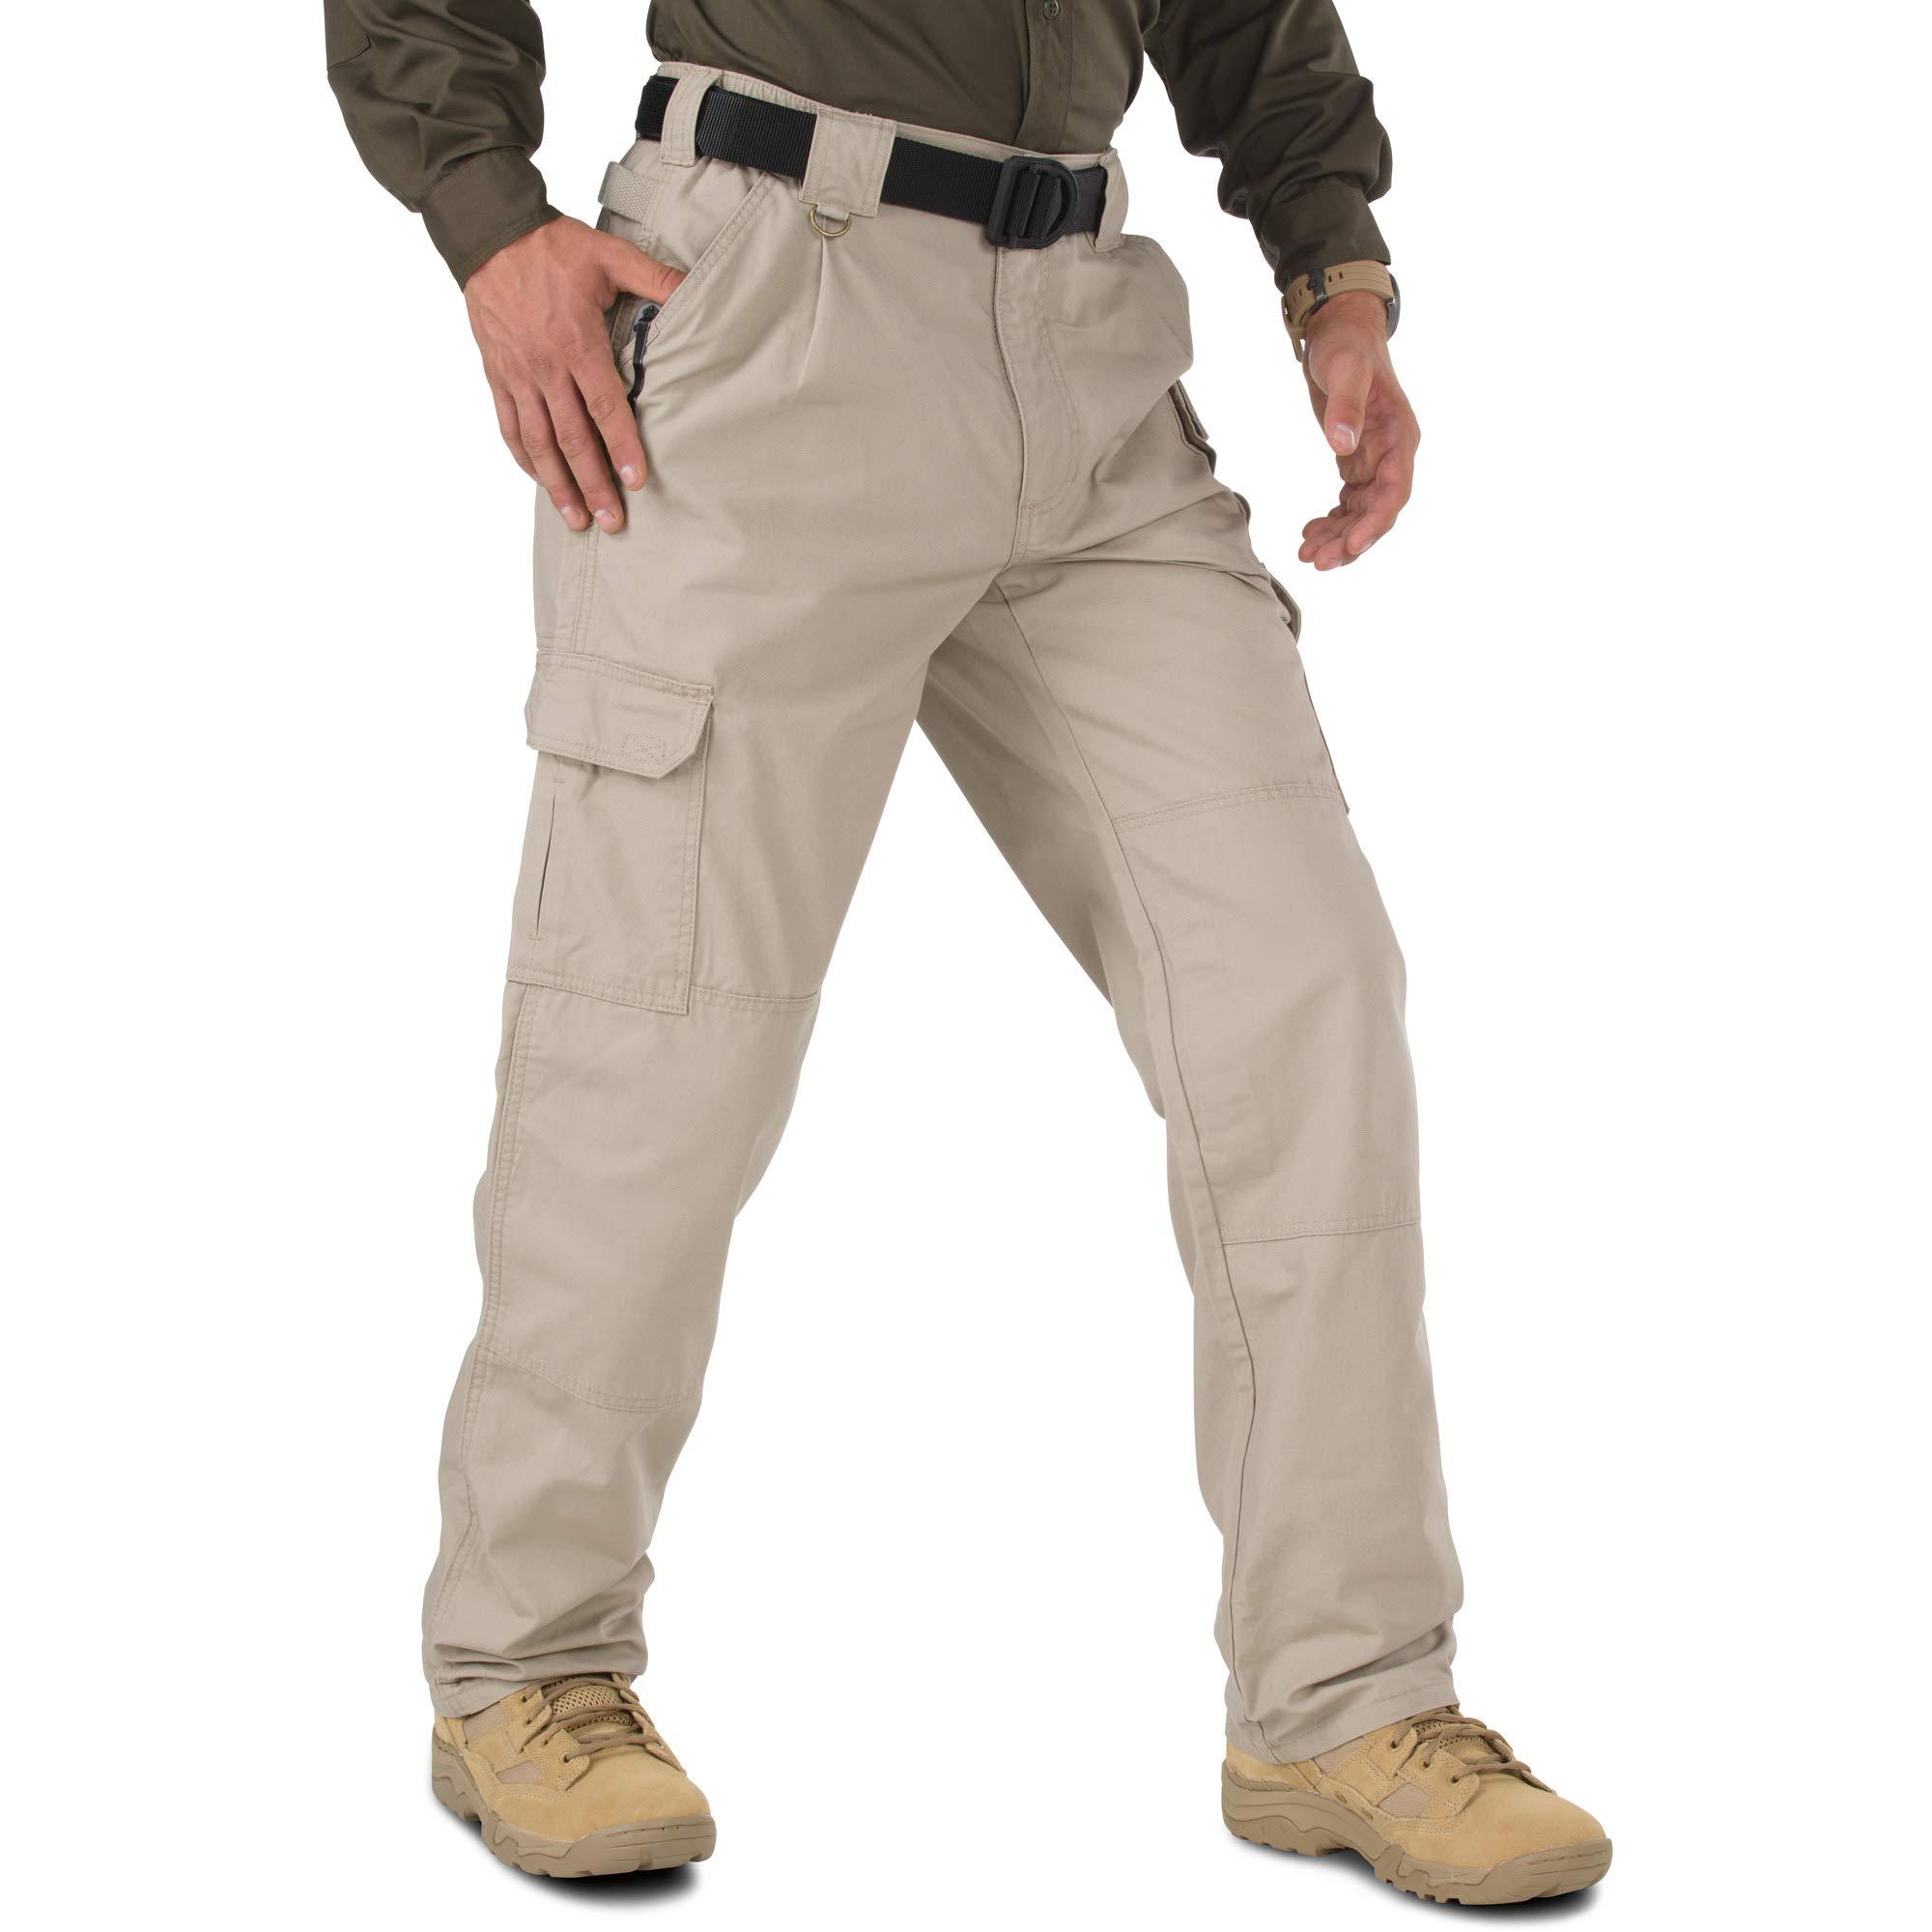 5.11 Tactical Men's GSA Approved Work Pants 100% Cotton Teflon Treatment Cargo Pockets Style 74252